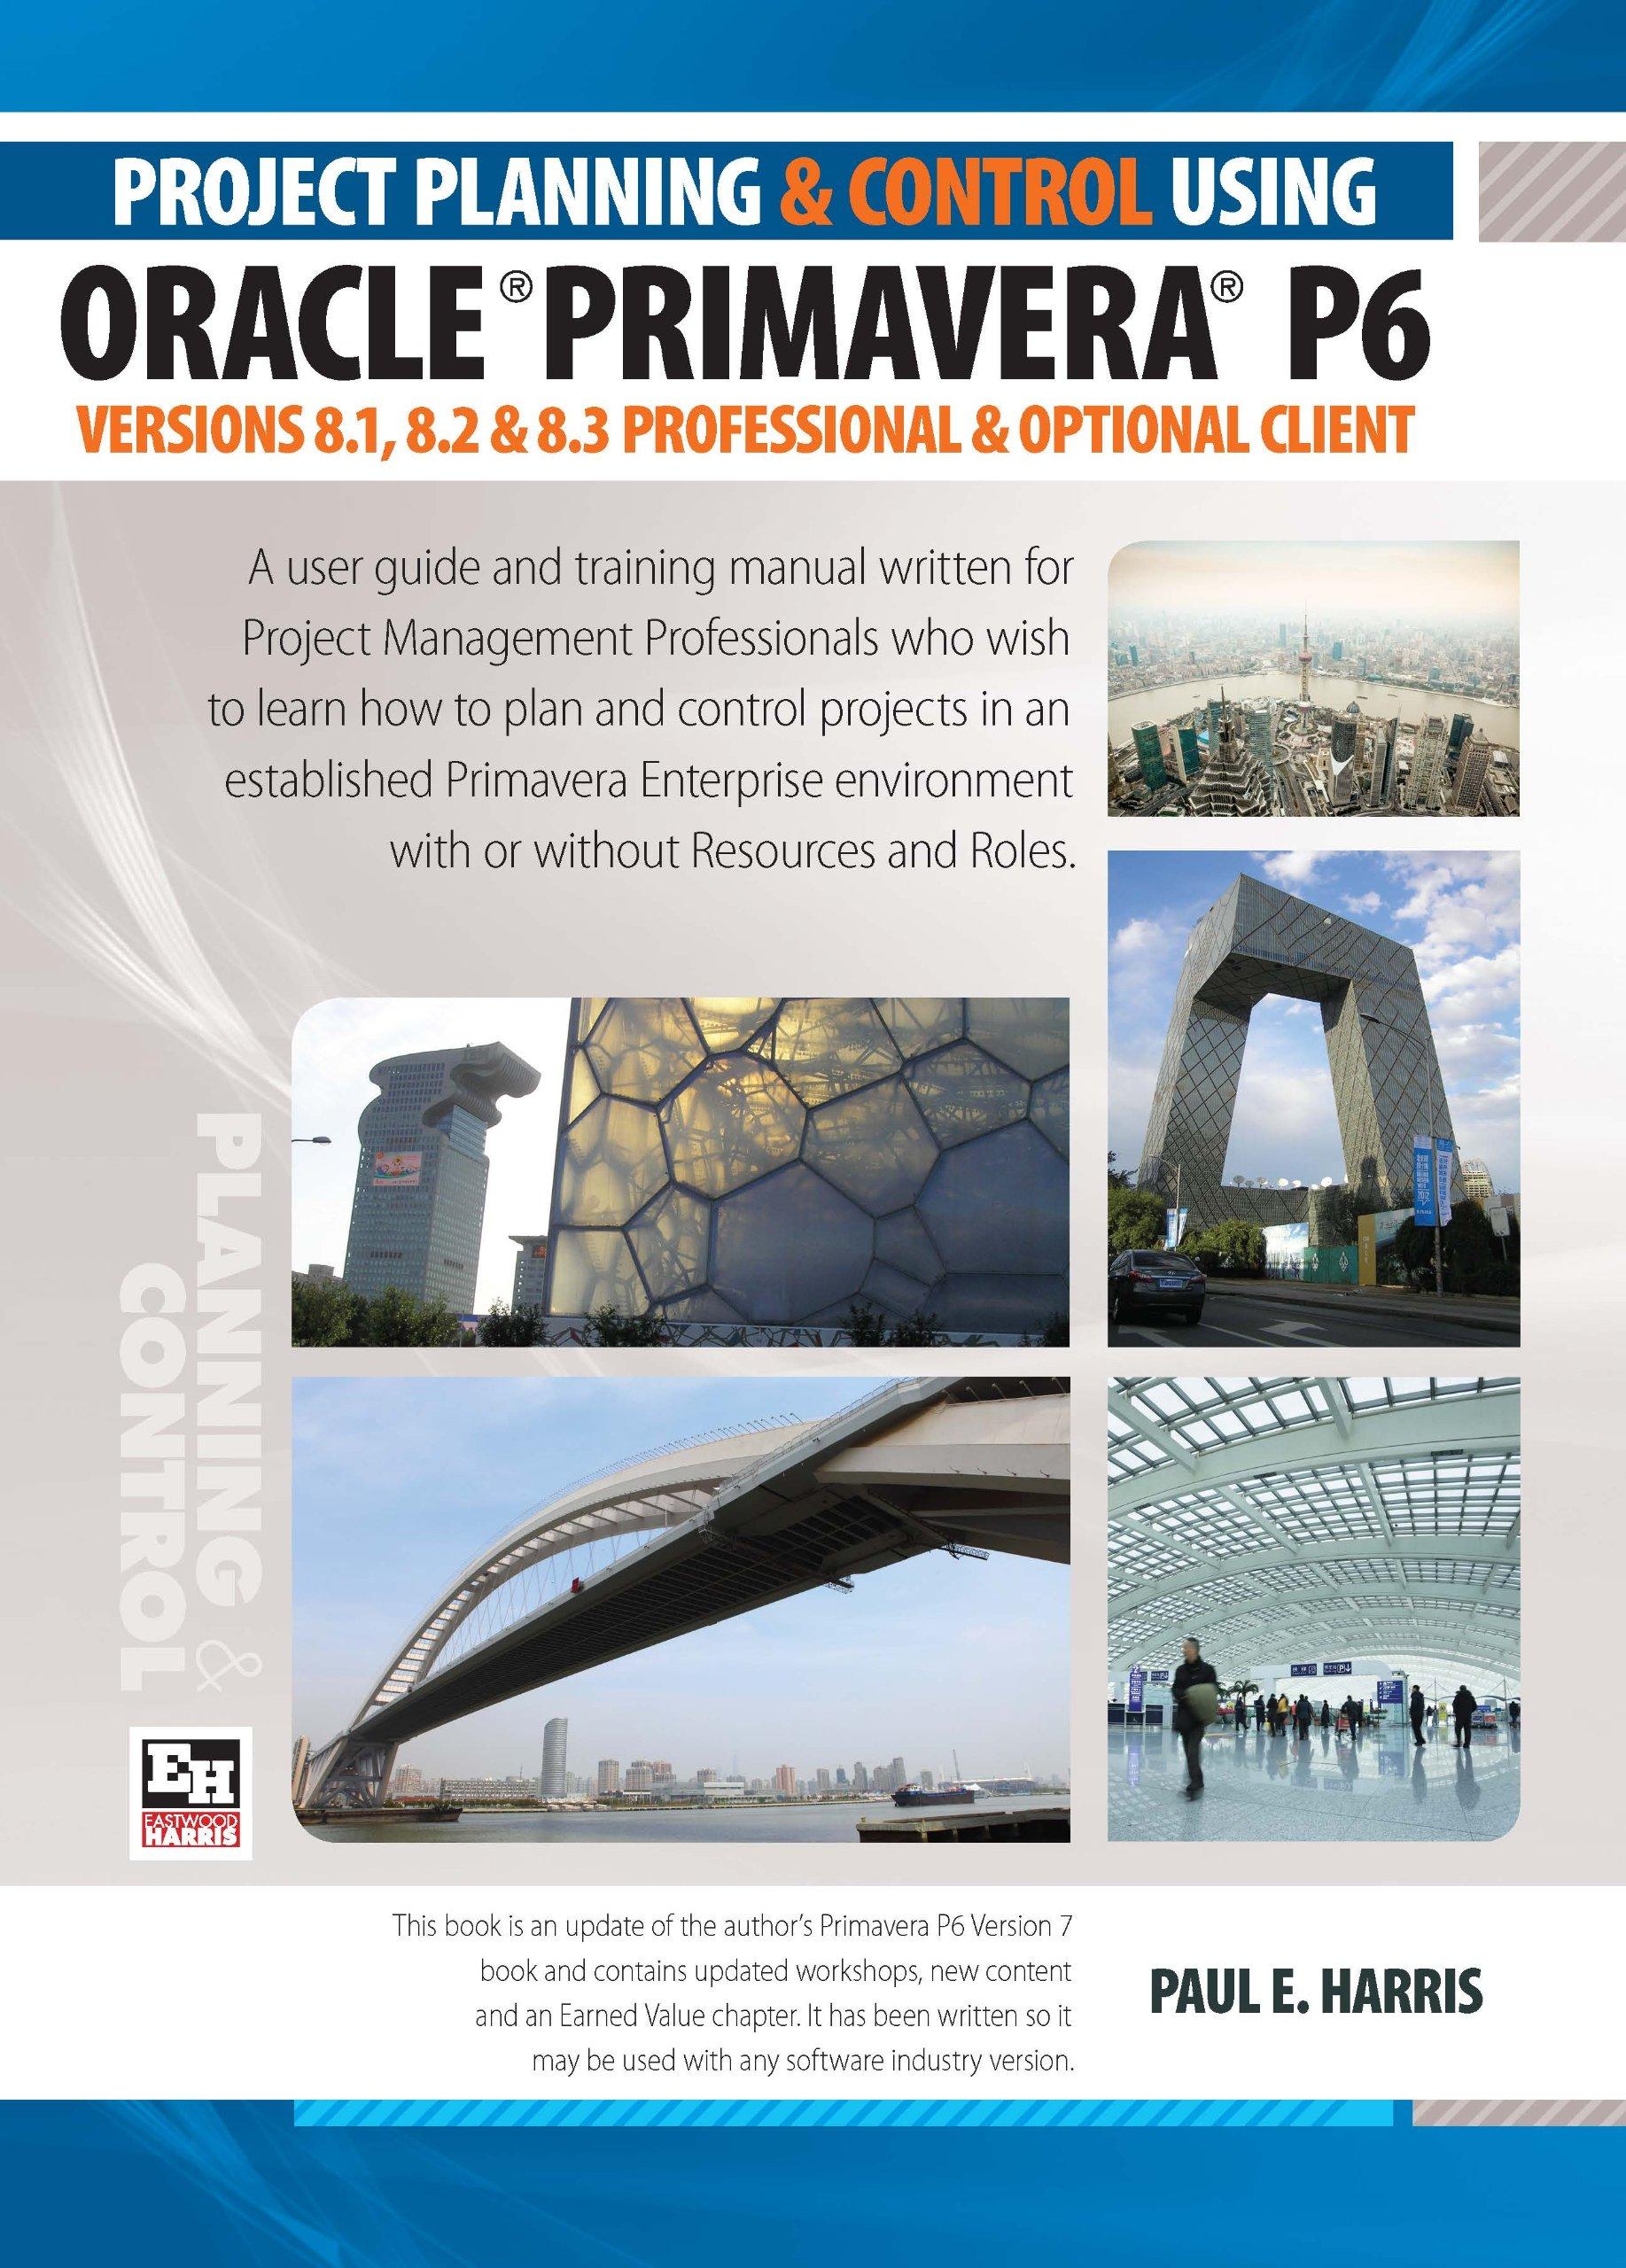 amazon com project planning and control using oracle primavera p6 rh amazon com Primavera P6 Planning Primavera P6 Command List